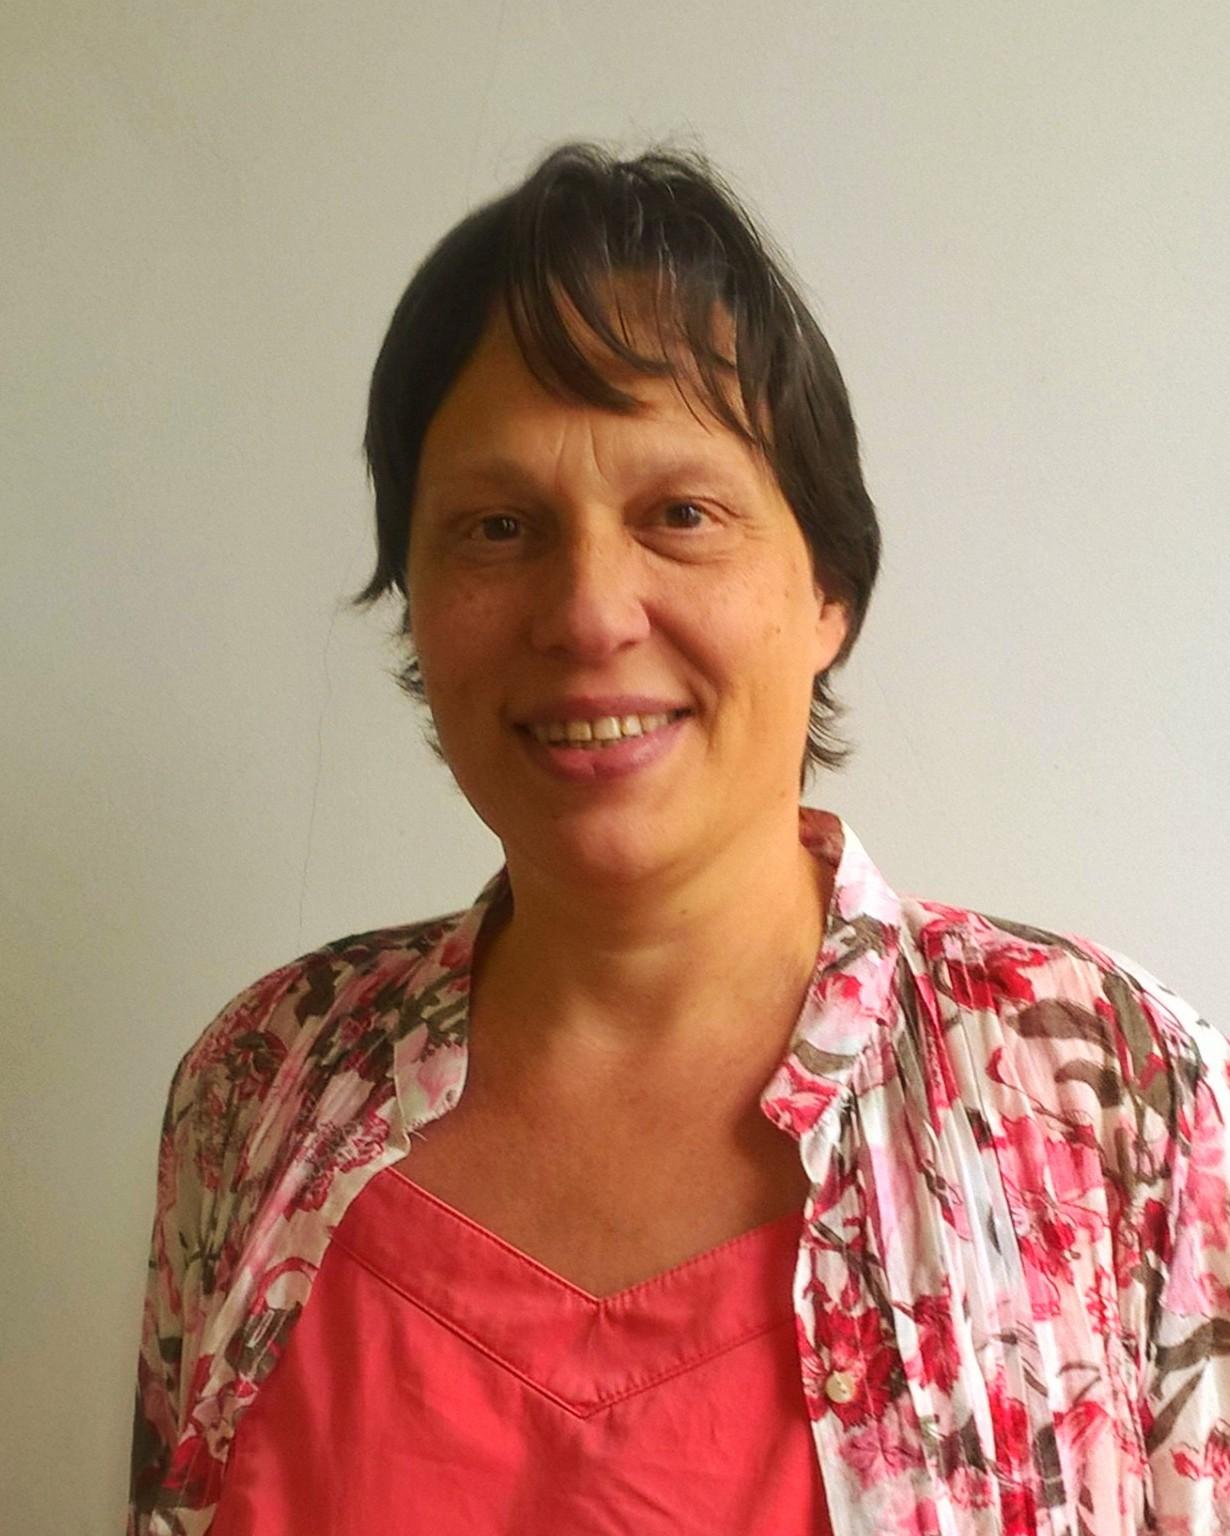 Annie Lens, Project Coordinator on Cultural Education, Culture service, Belgium